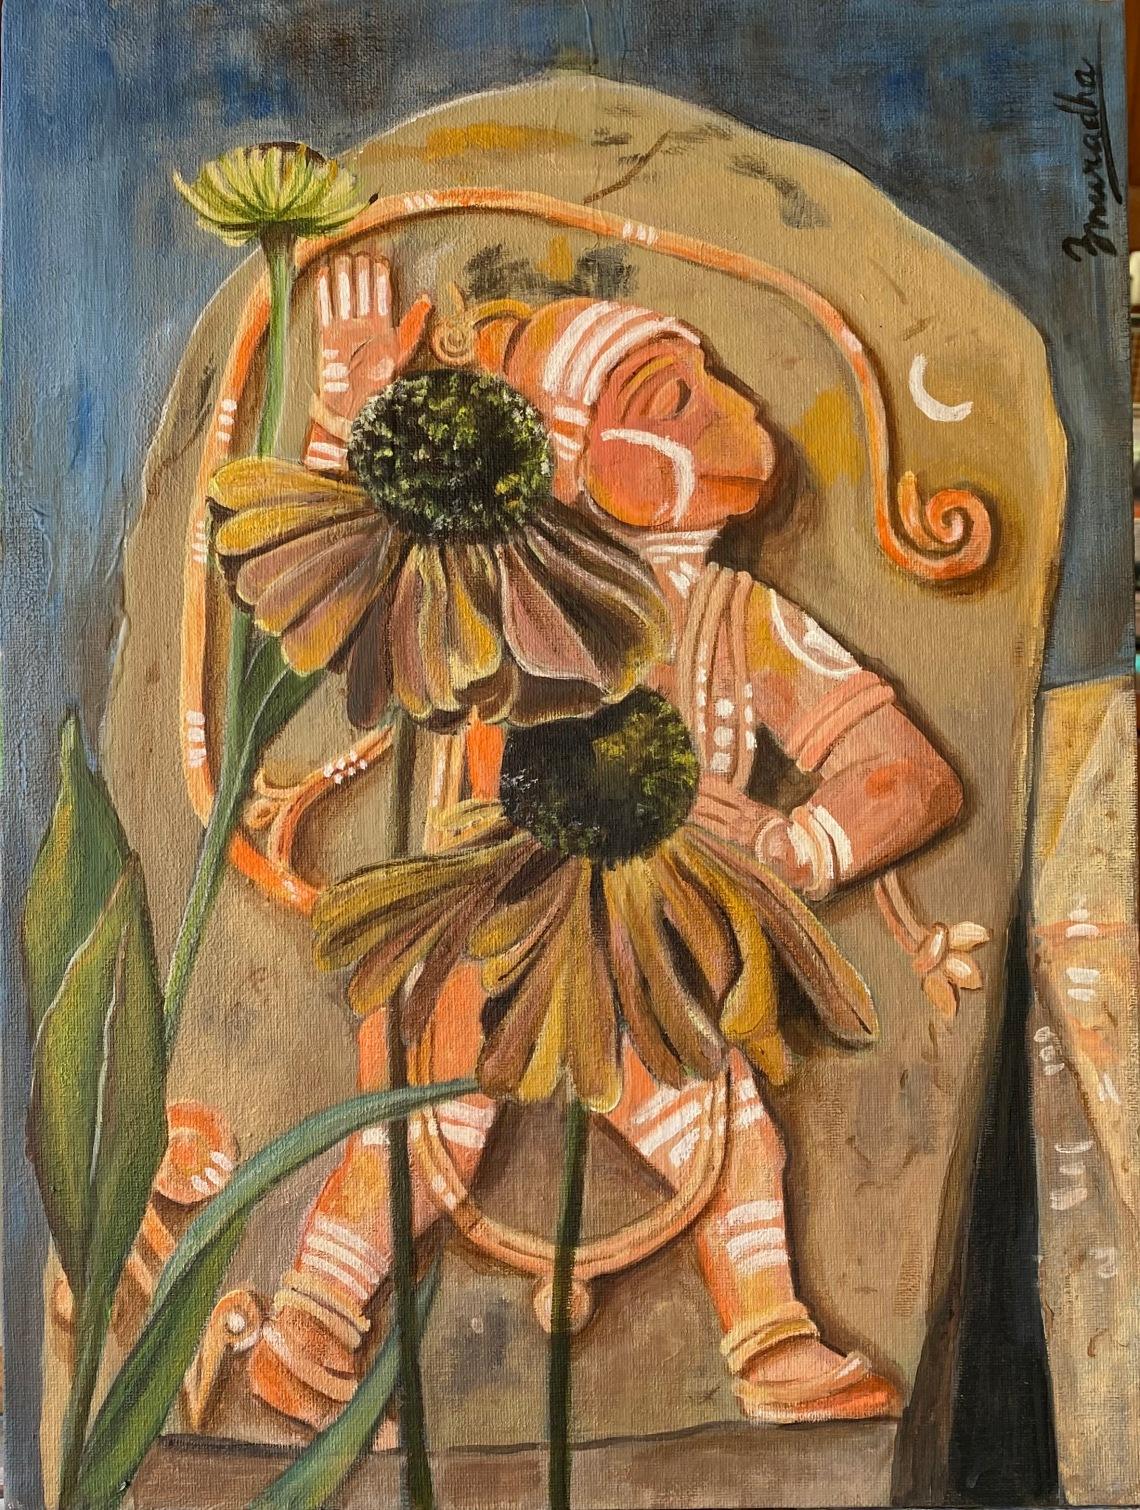 Hanuman-on the block